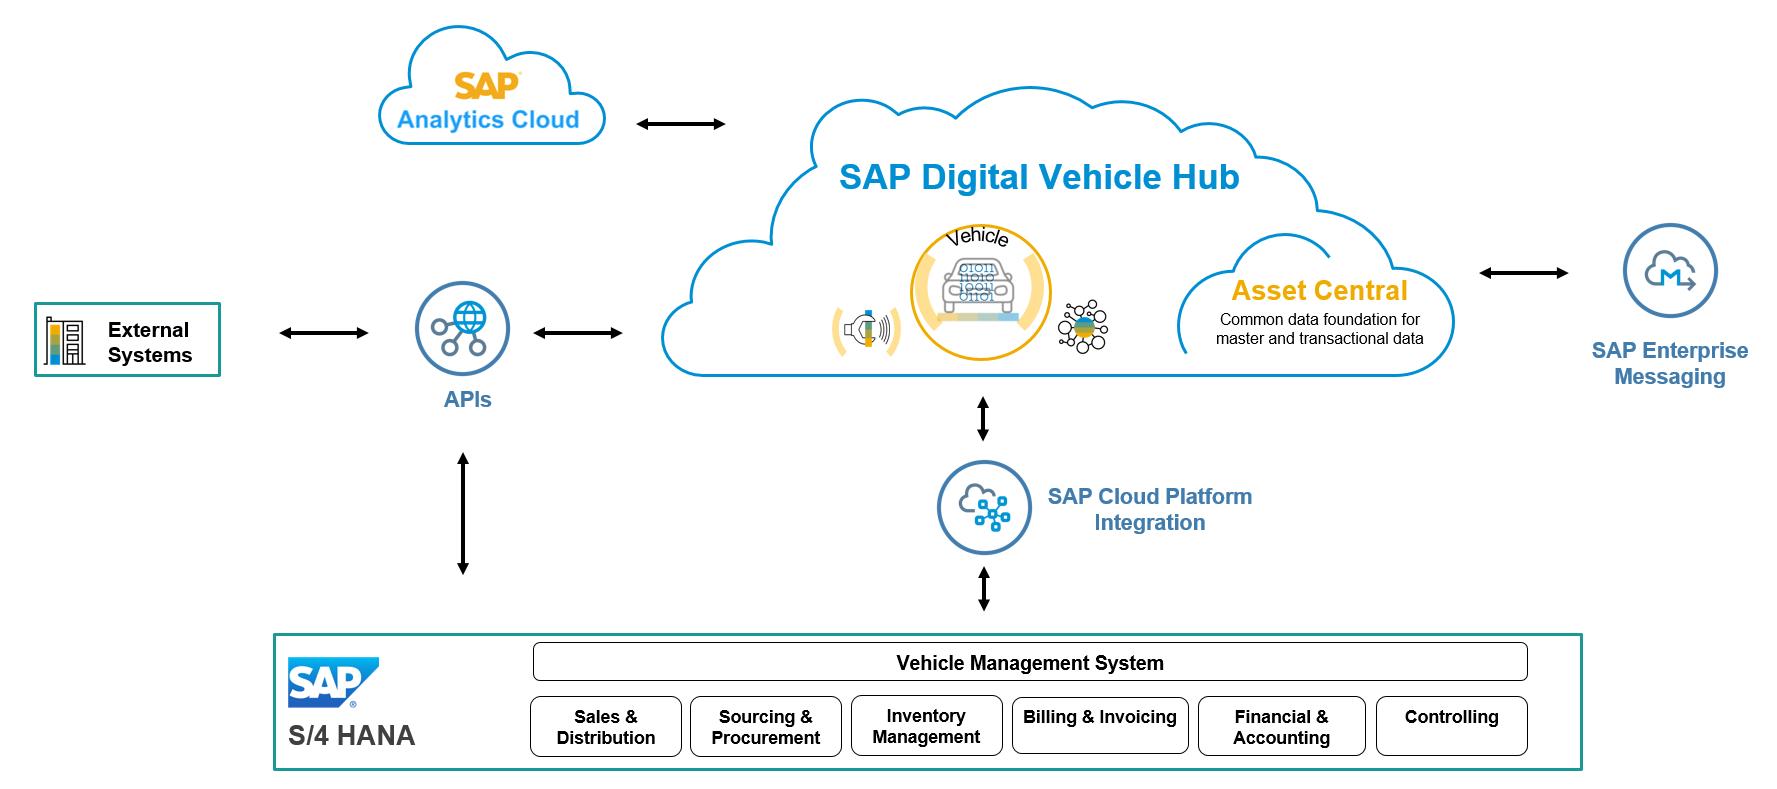 SAP Digital Vehicle Hub Architecture